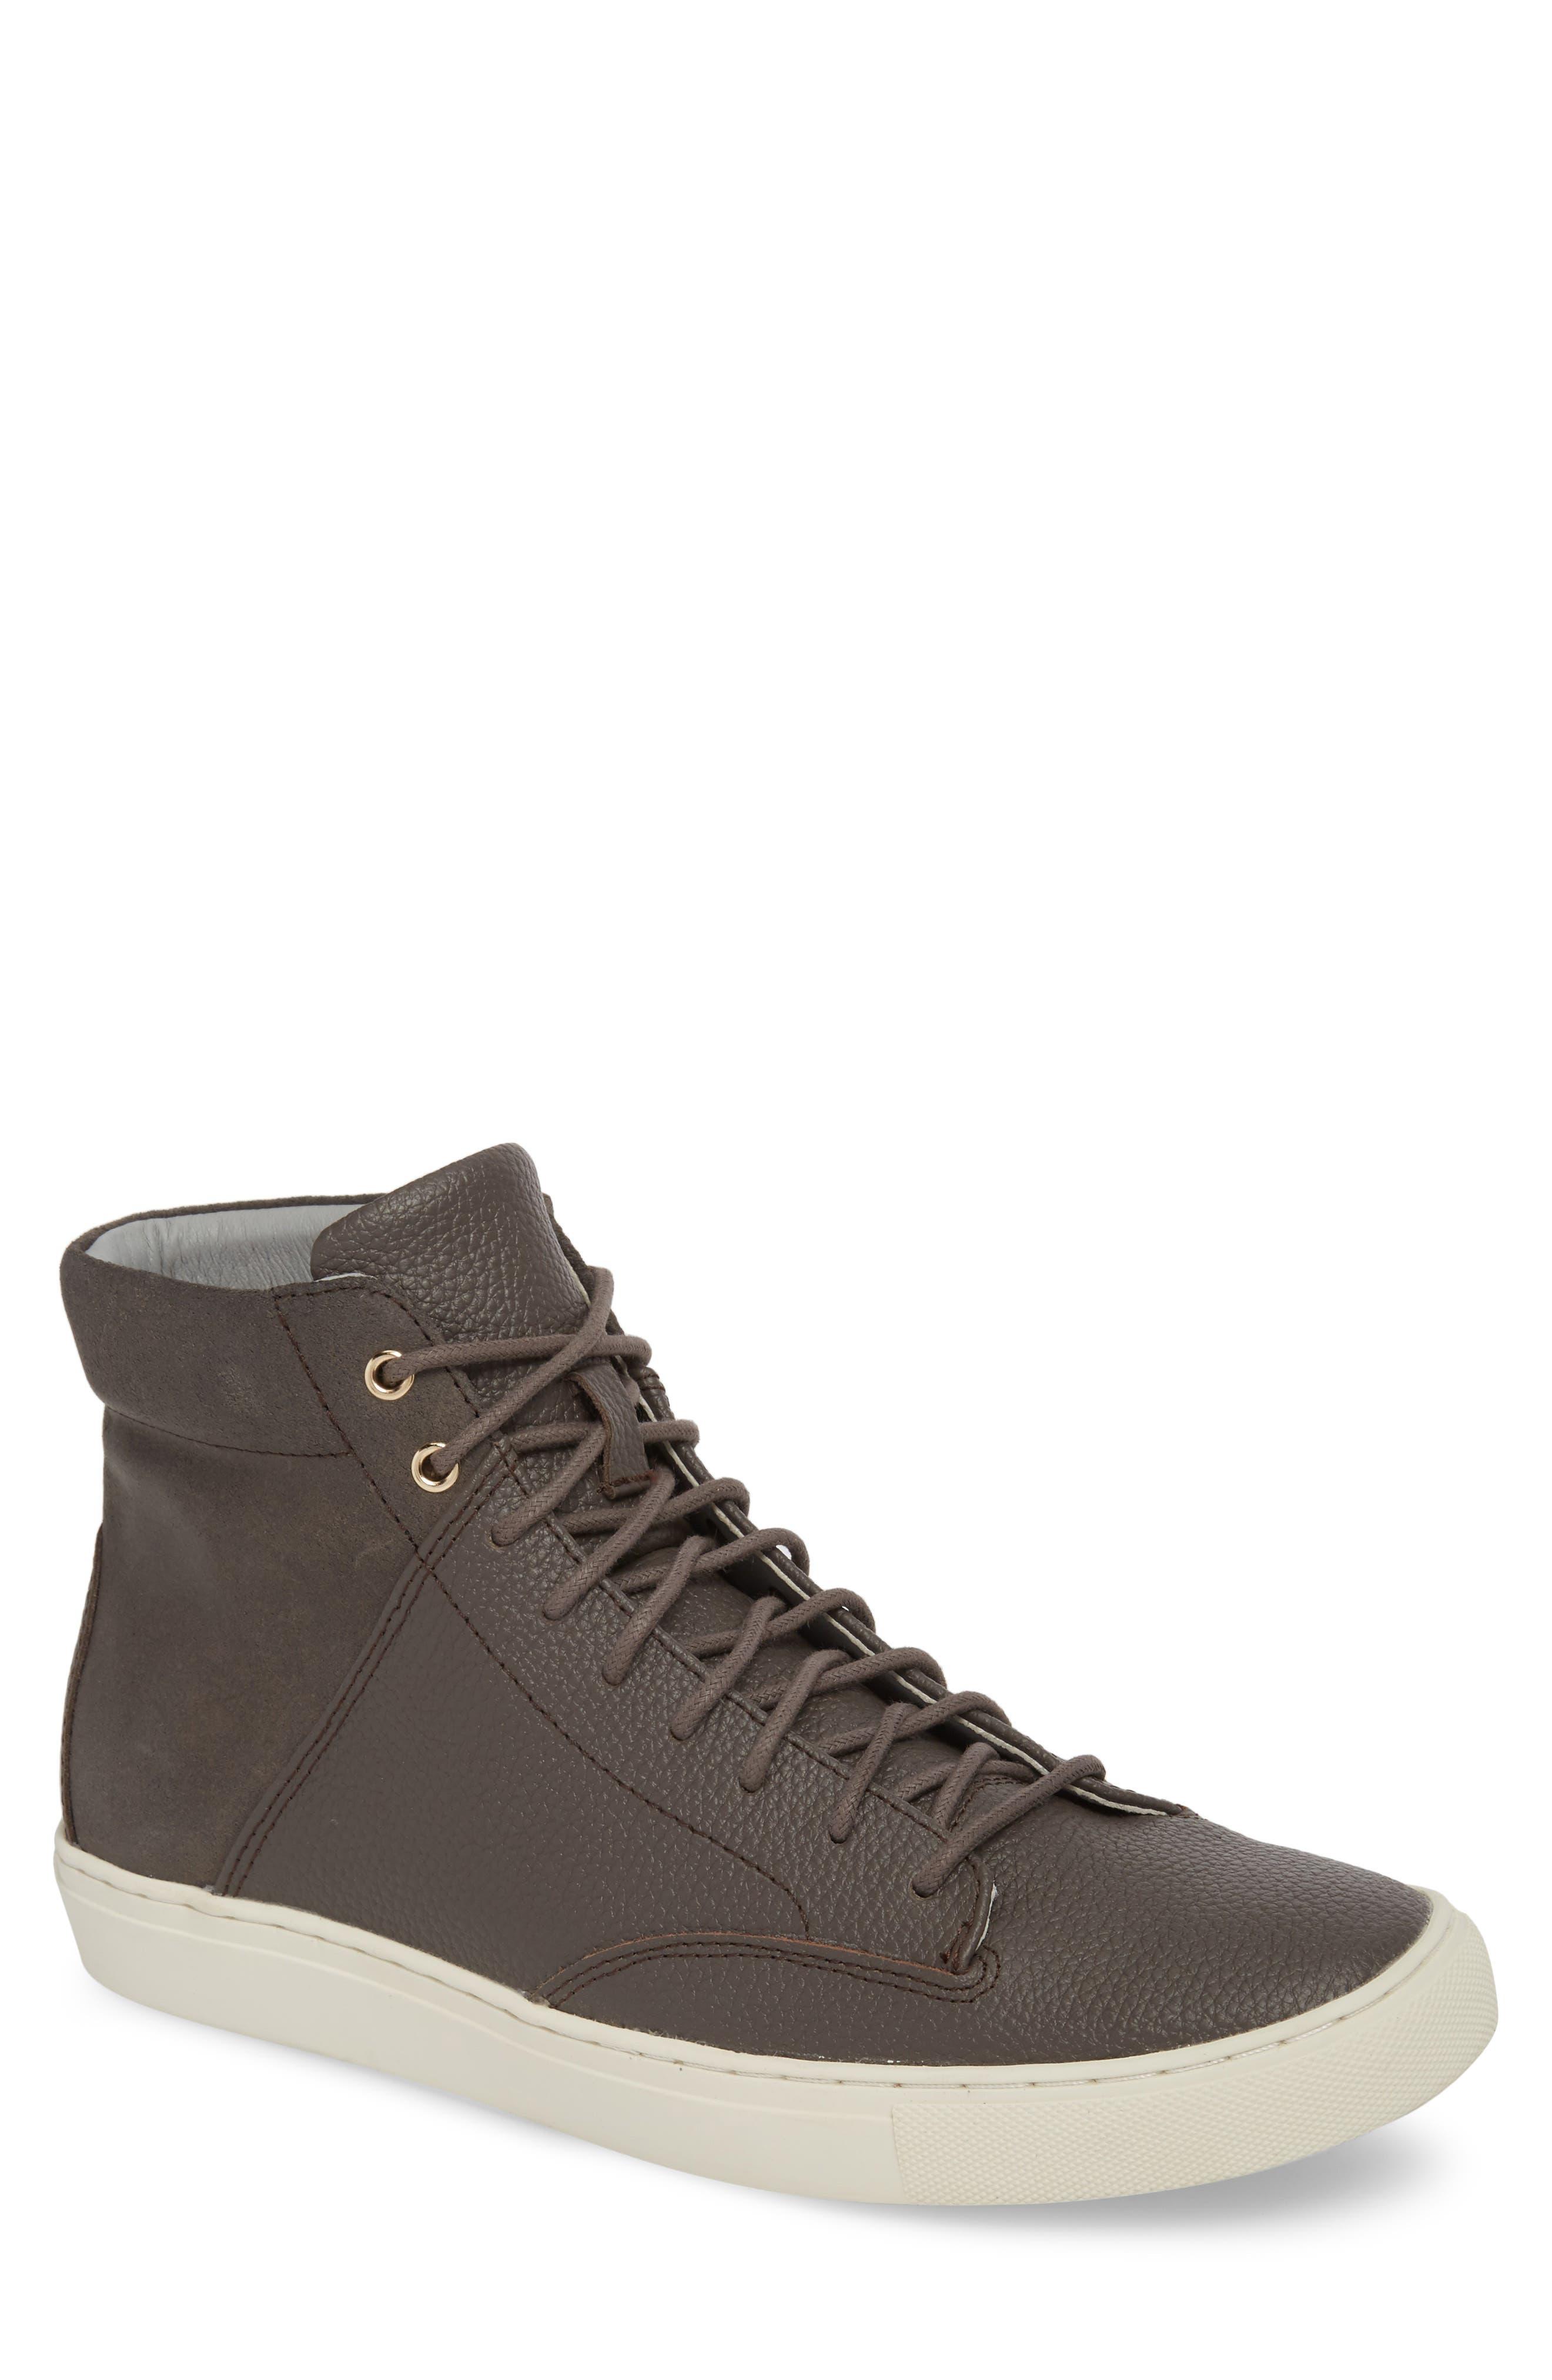 TCG Porter High Top Sneaker (Men)